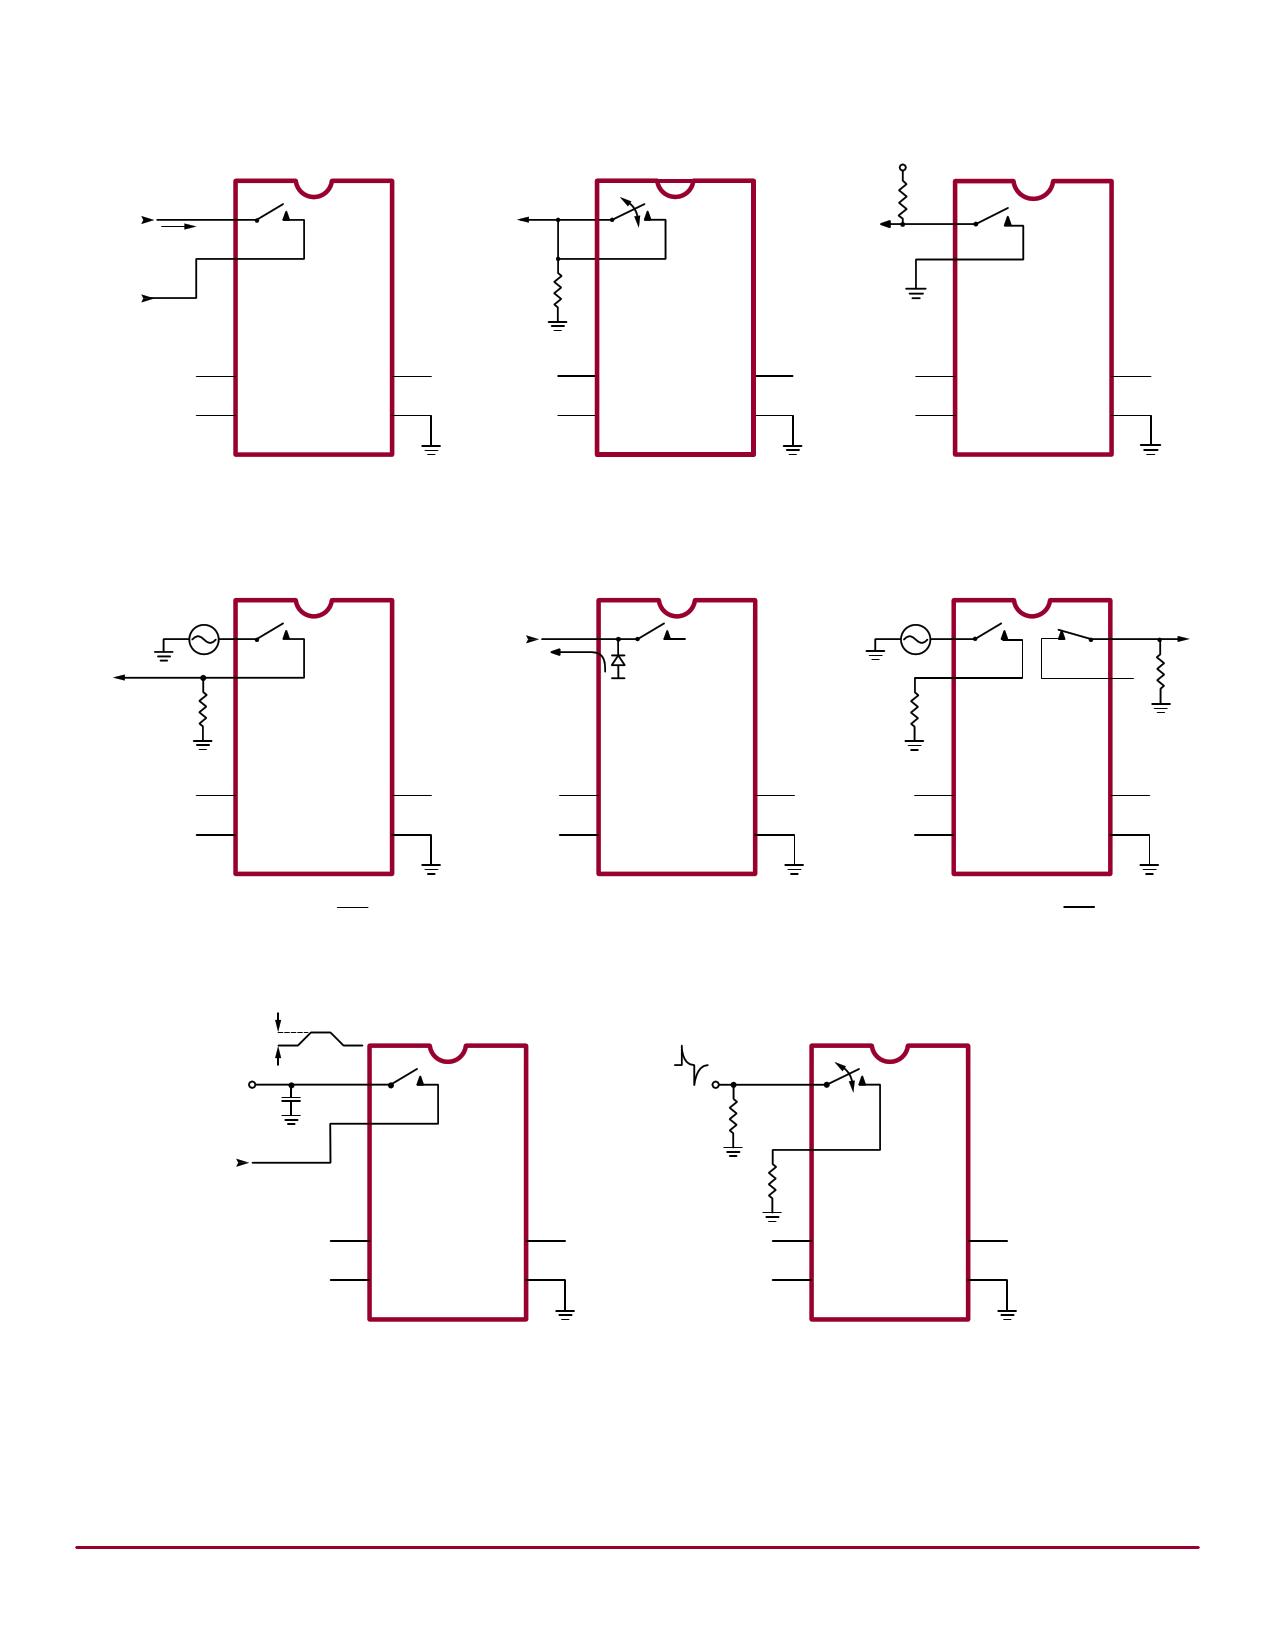 HV20220PJ 電子部品, 半導体